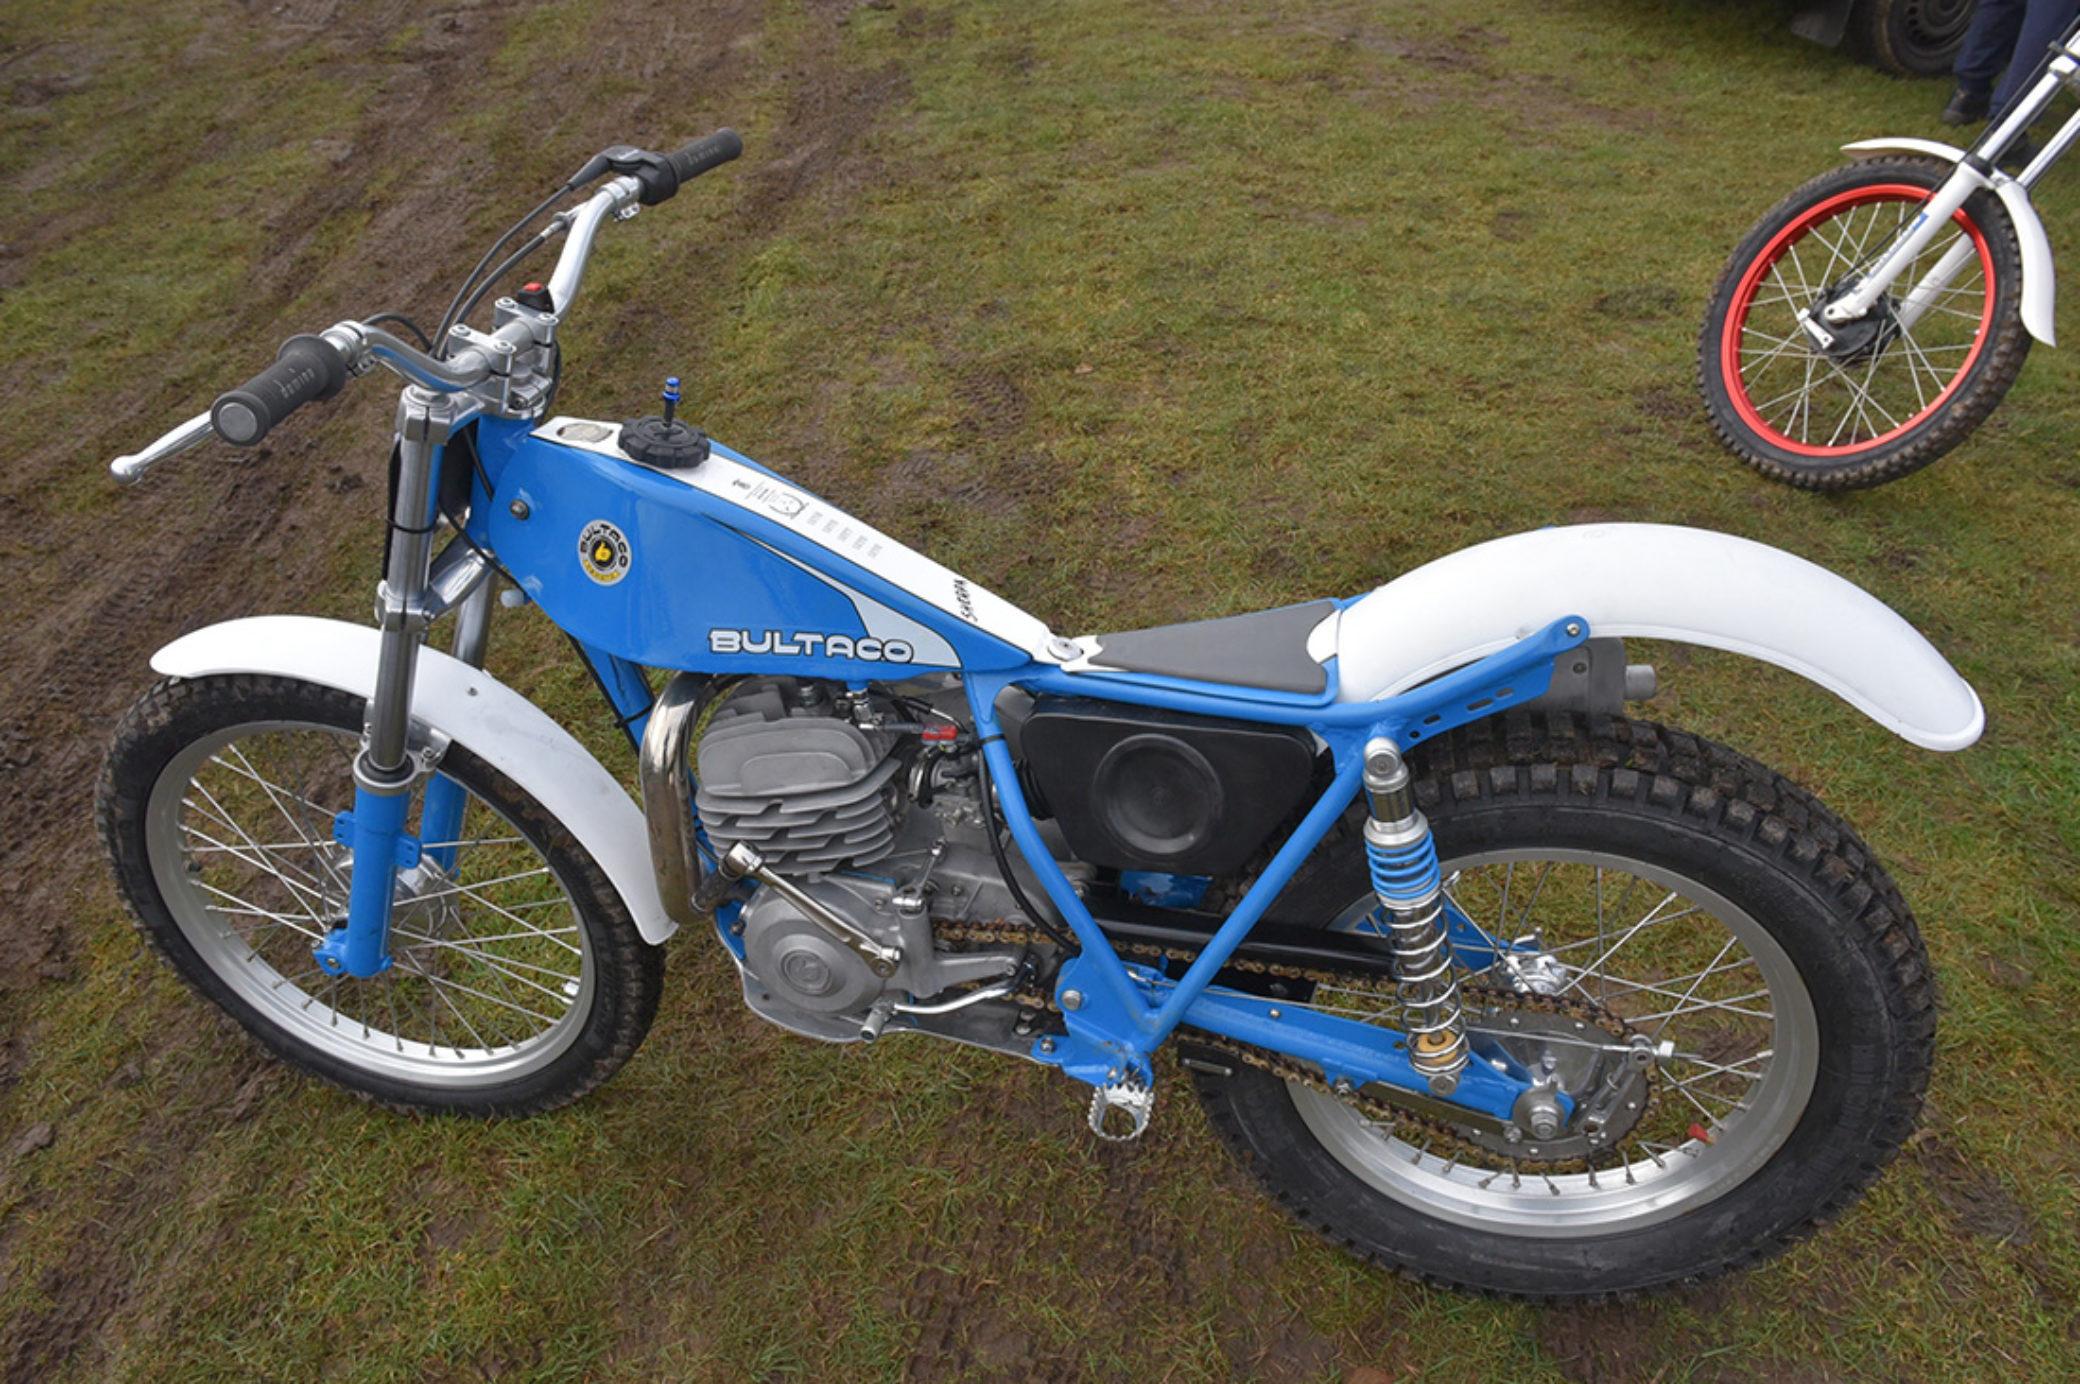 Take a look: Simon Bown's Bultaco